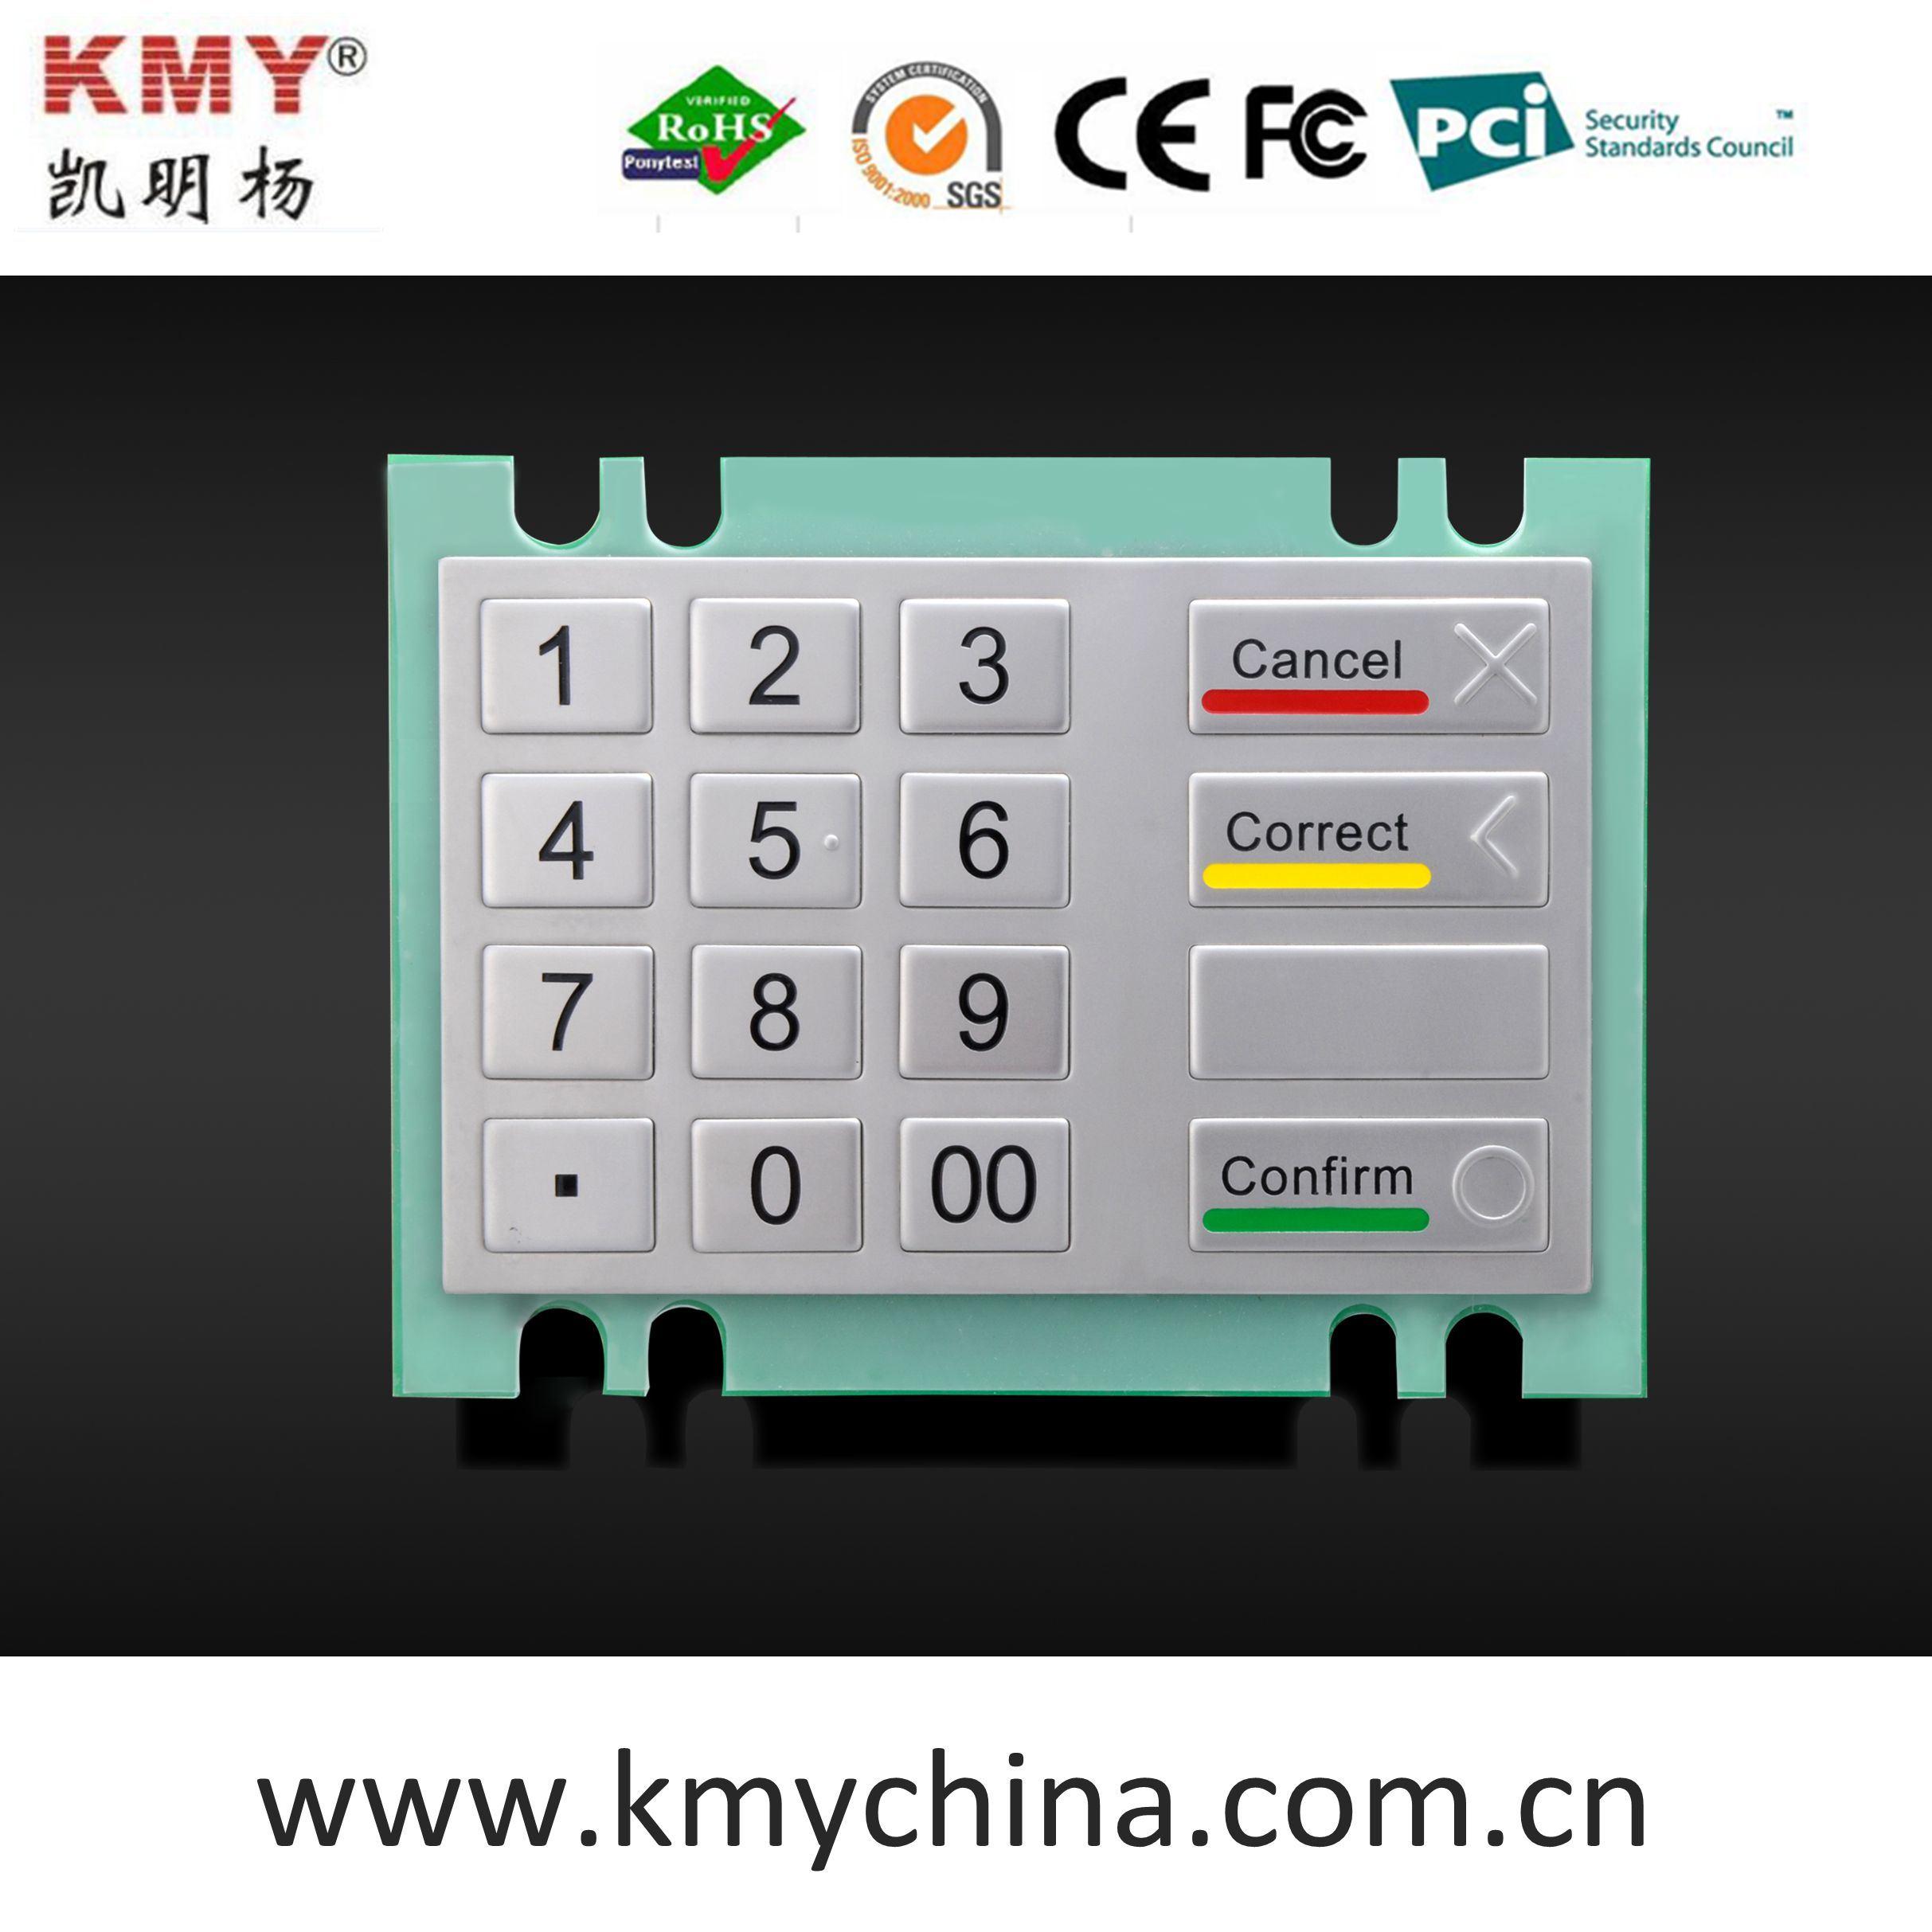 Hot Sale Waterproof Metal Numeric Keypad for Kiosk (KMY3503A)